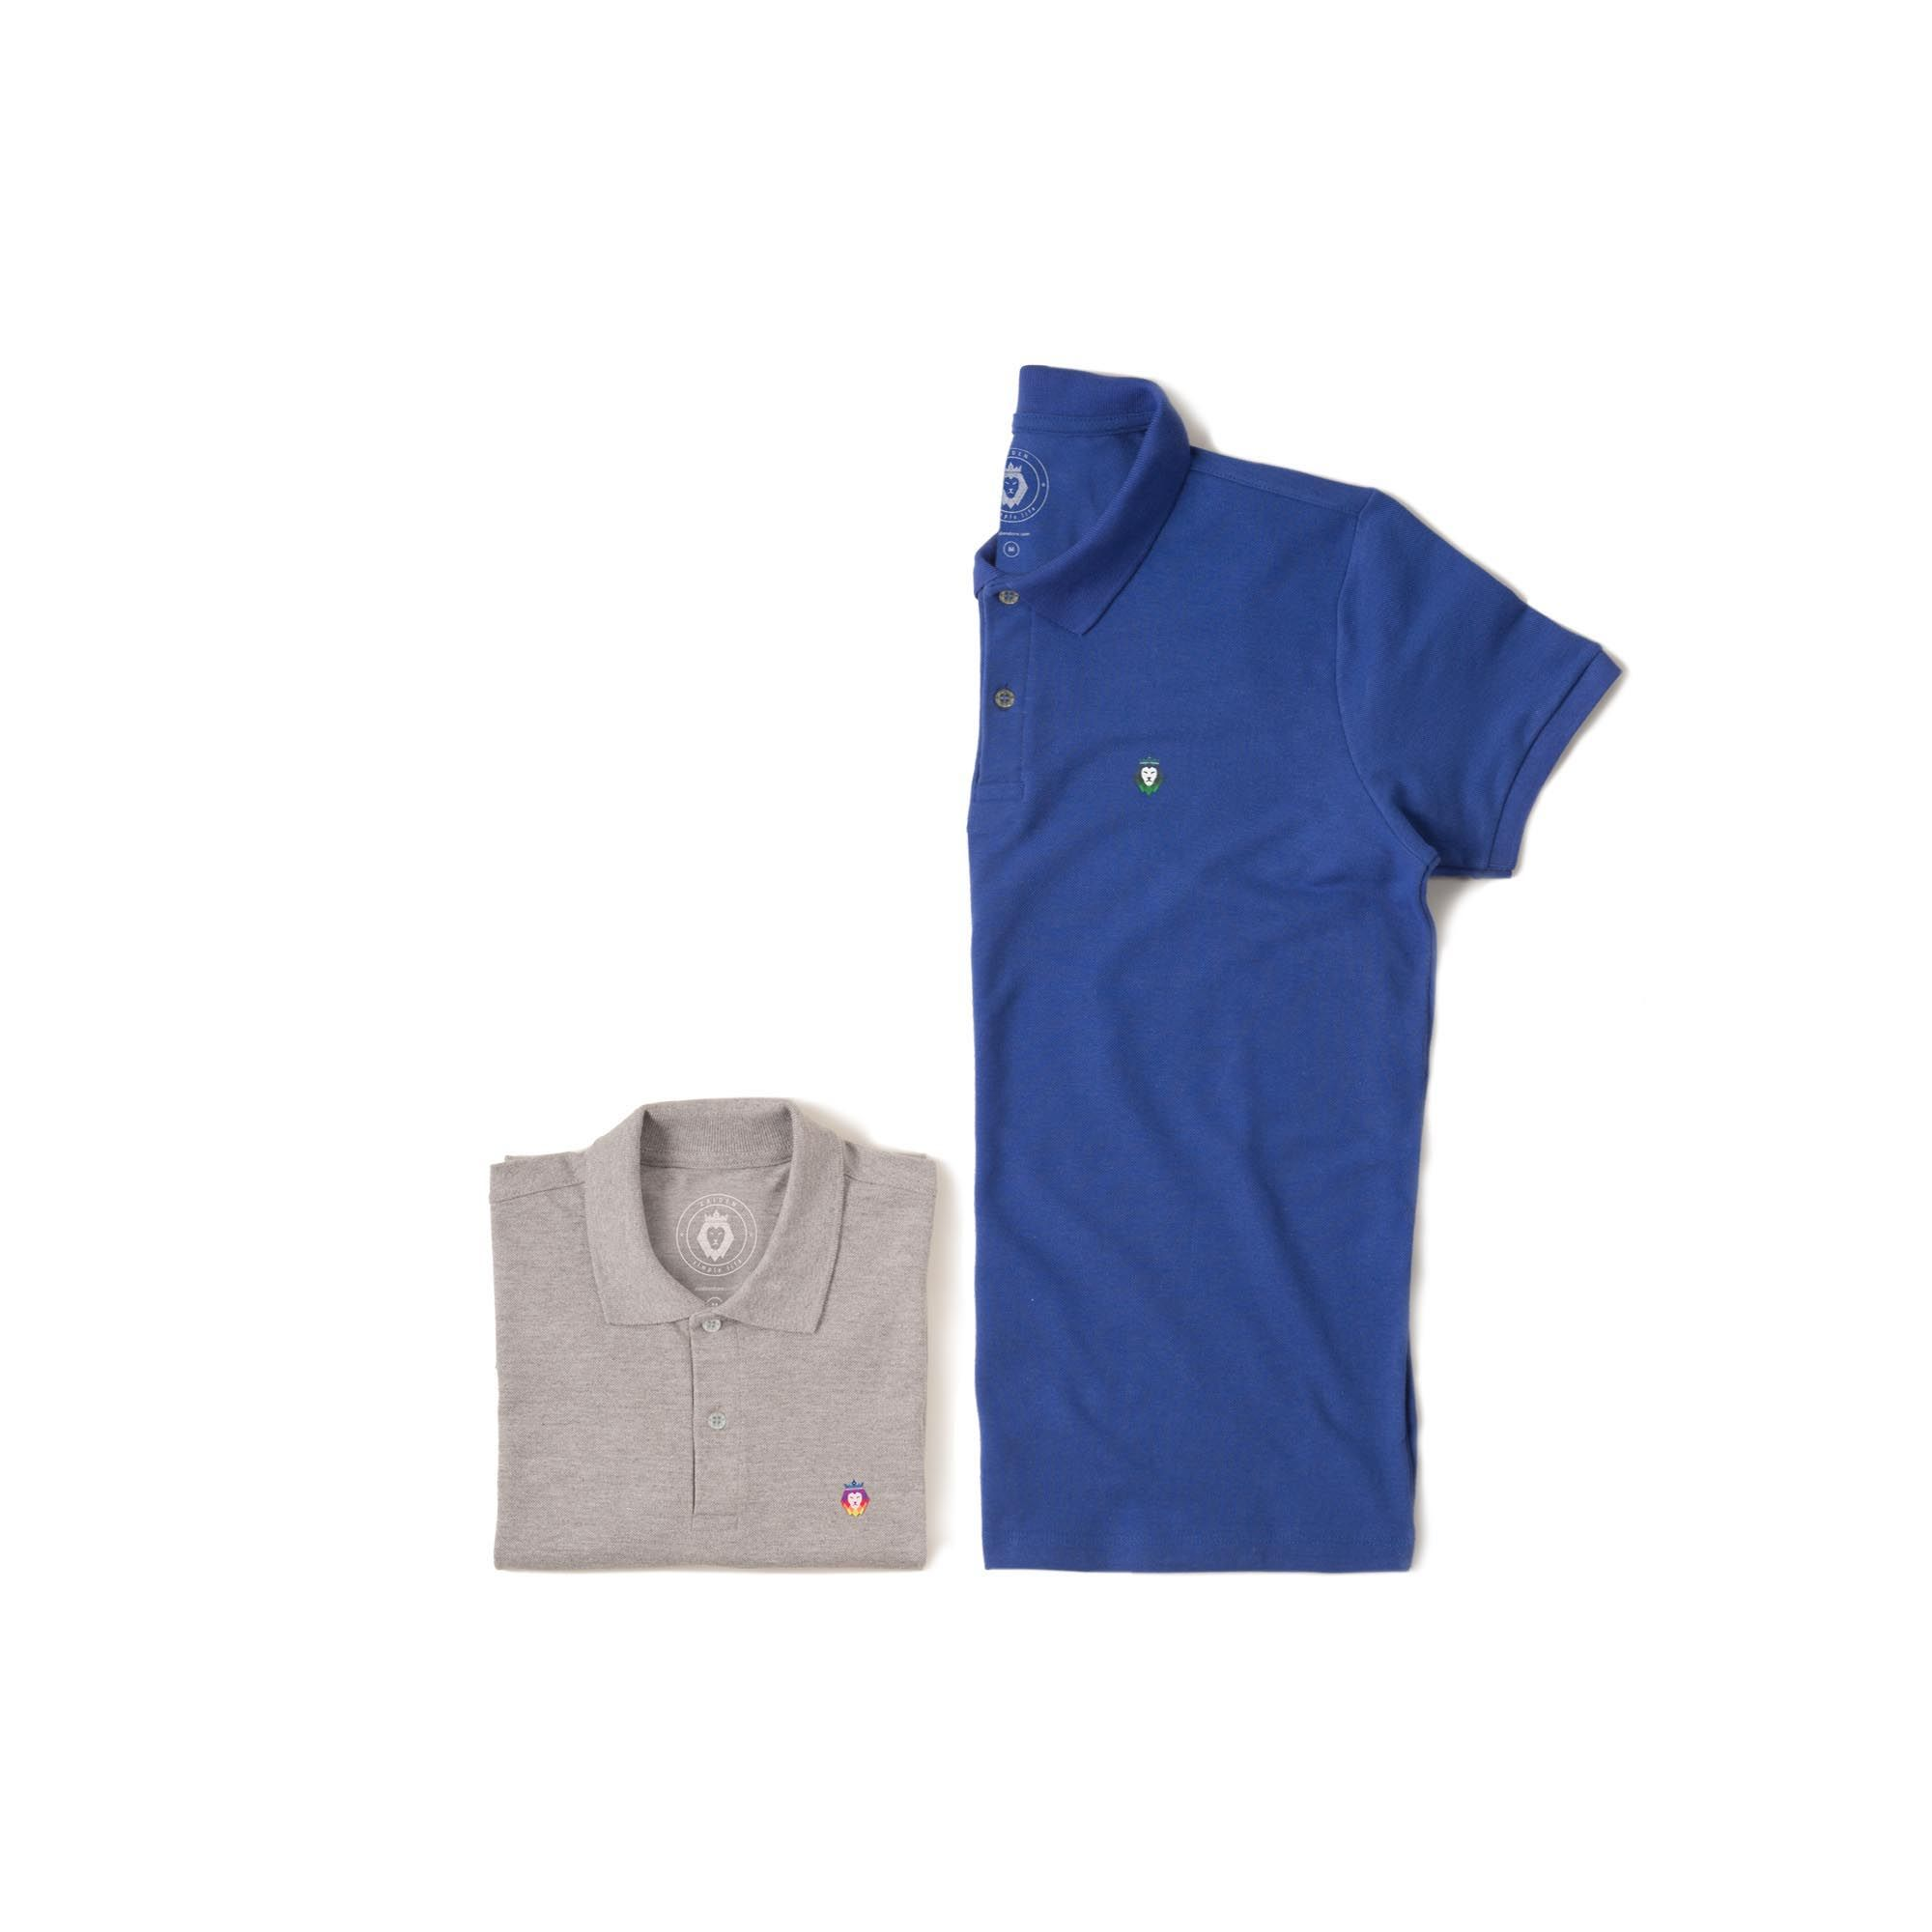 Kit 2 Camisas Polo Basic Zaiden Royal Mescla Masculina